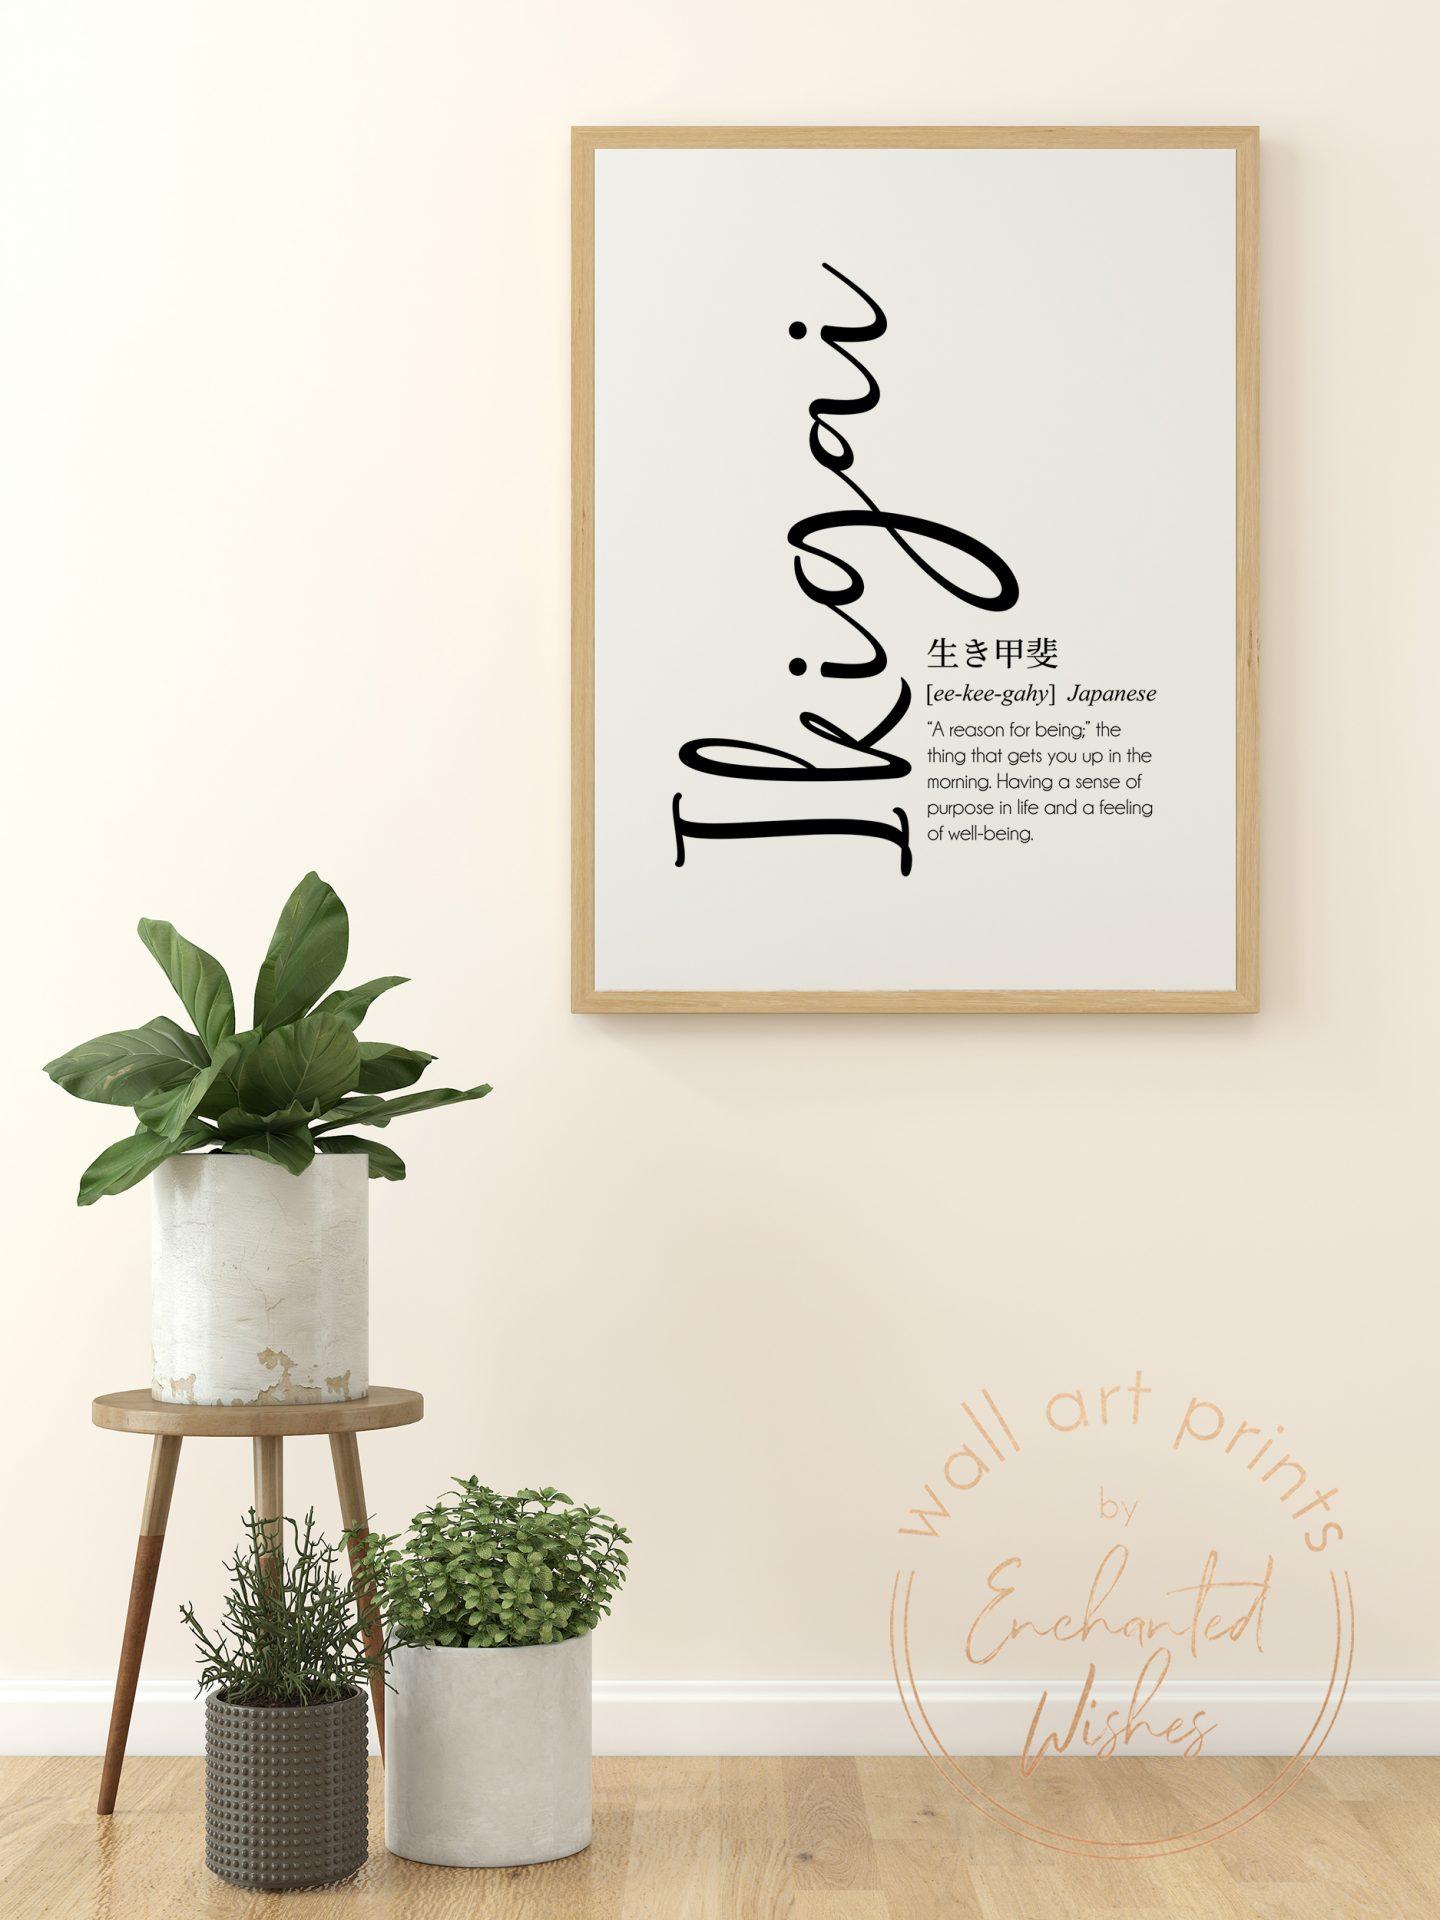 Ikigai definition print